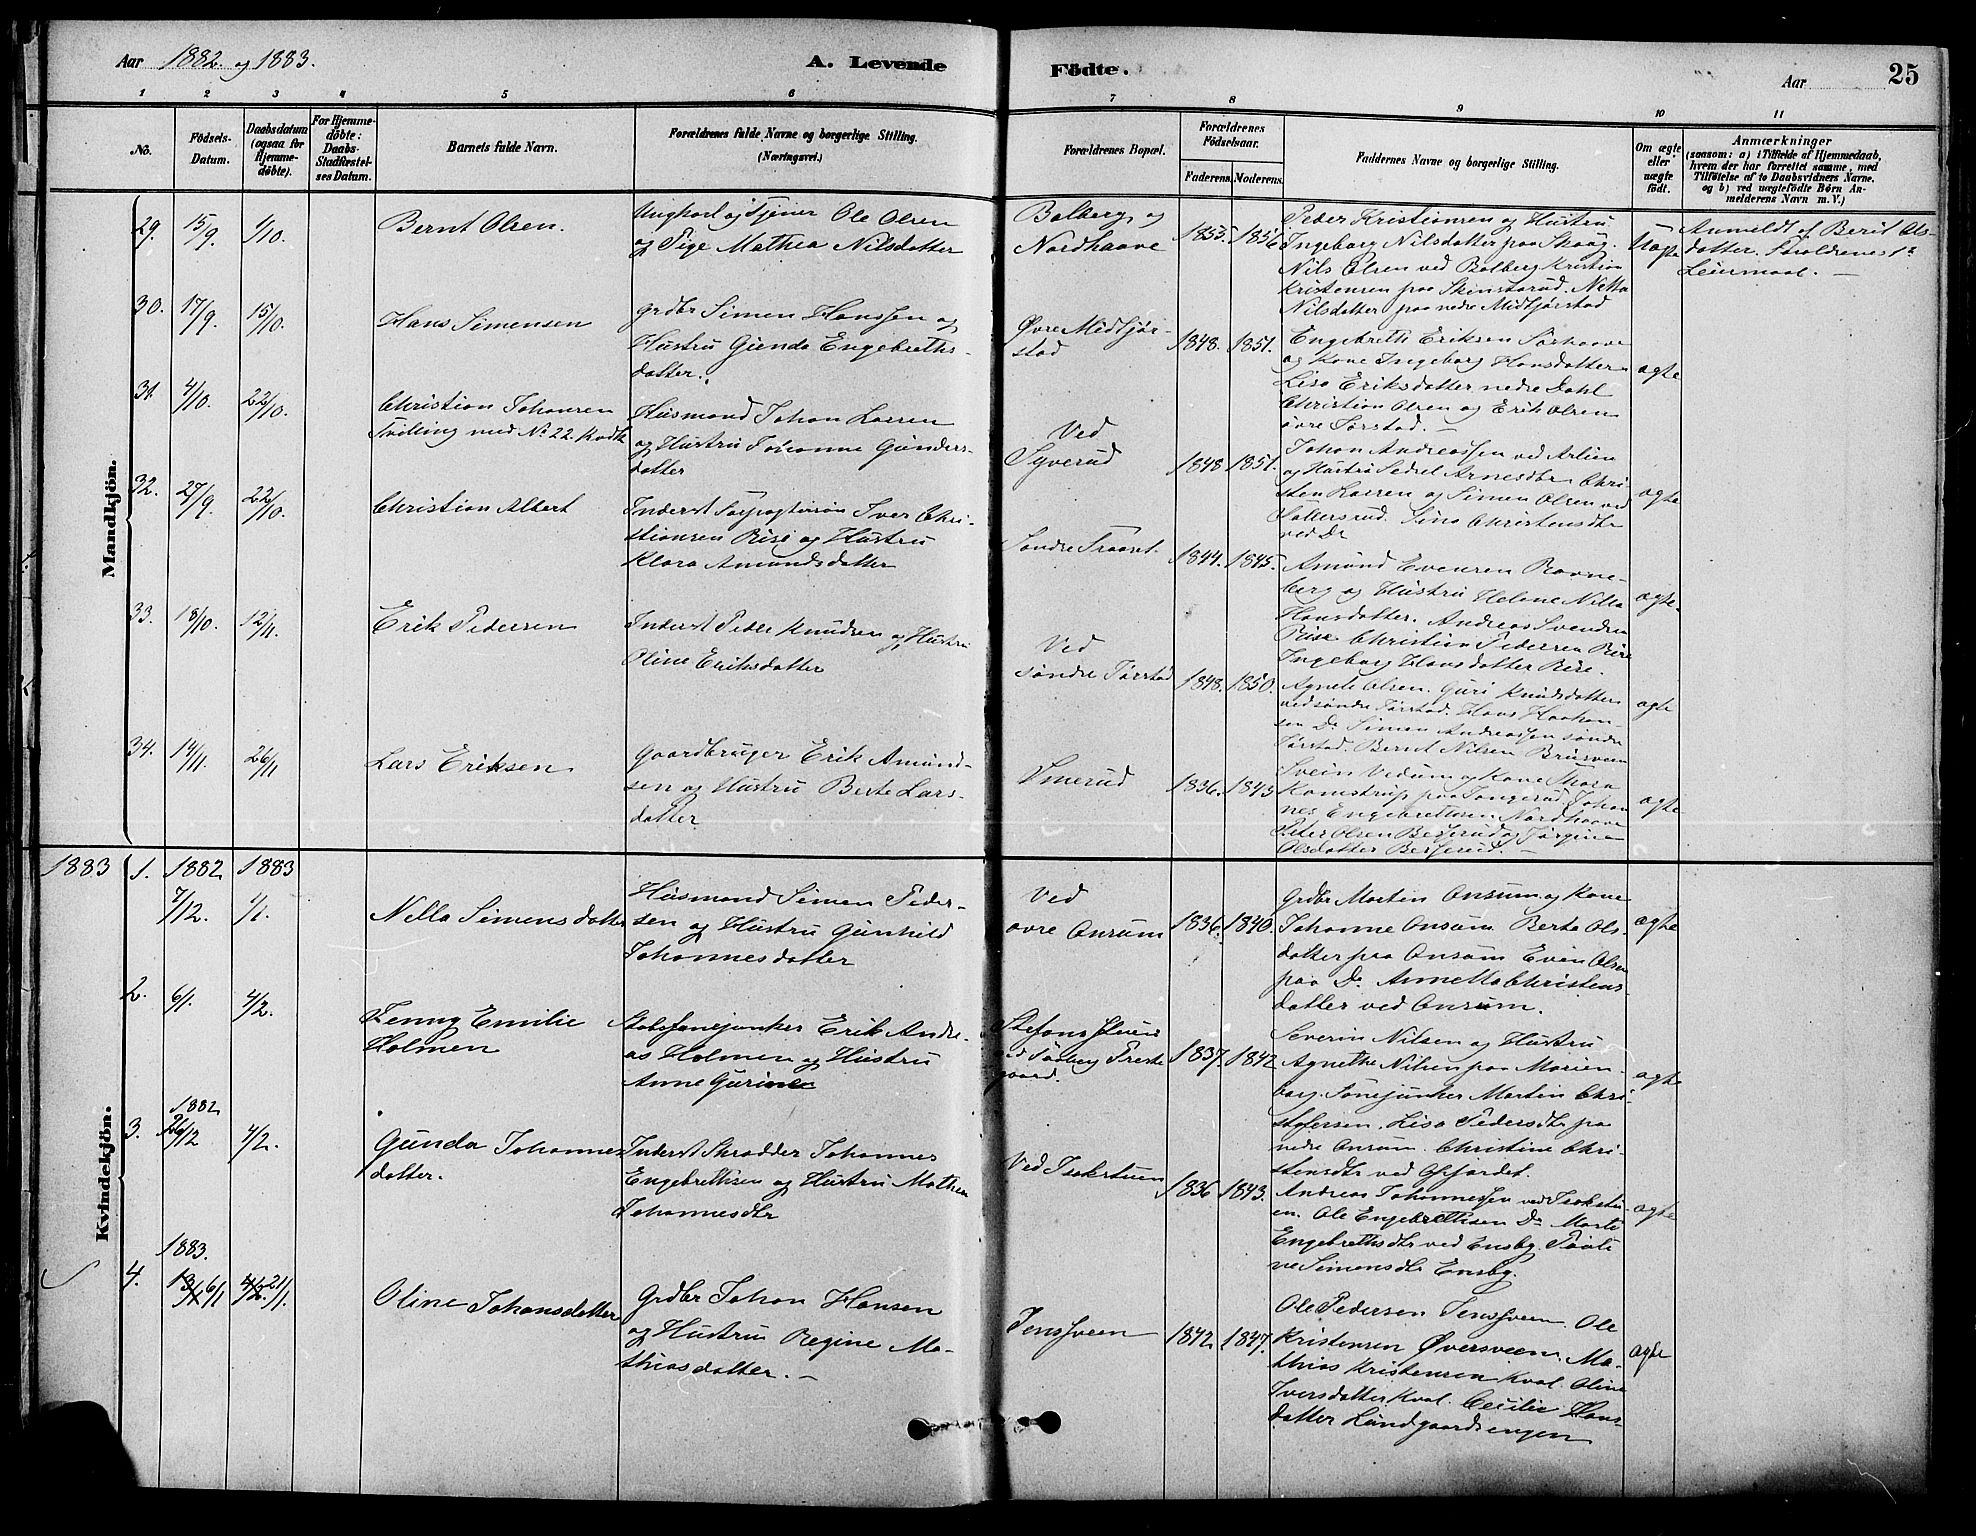 SAH, Fåberg prestekontor, Ministerialbok nr. 8, 1879-1898, s. 25